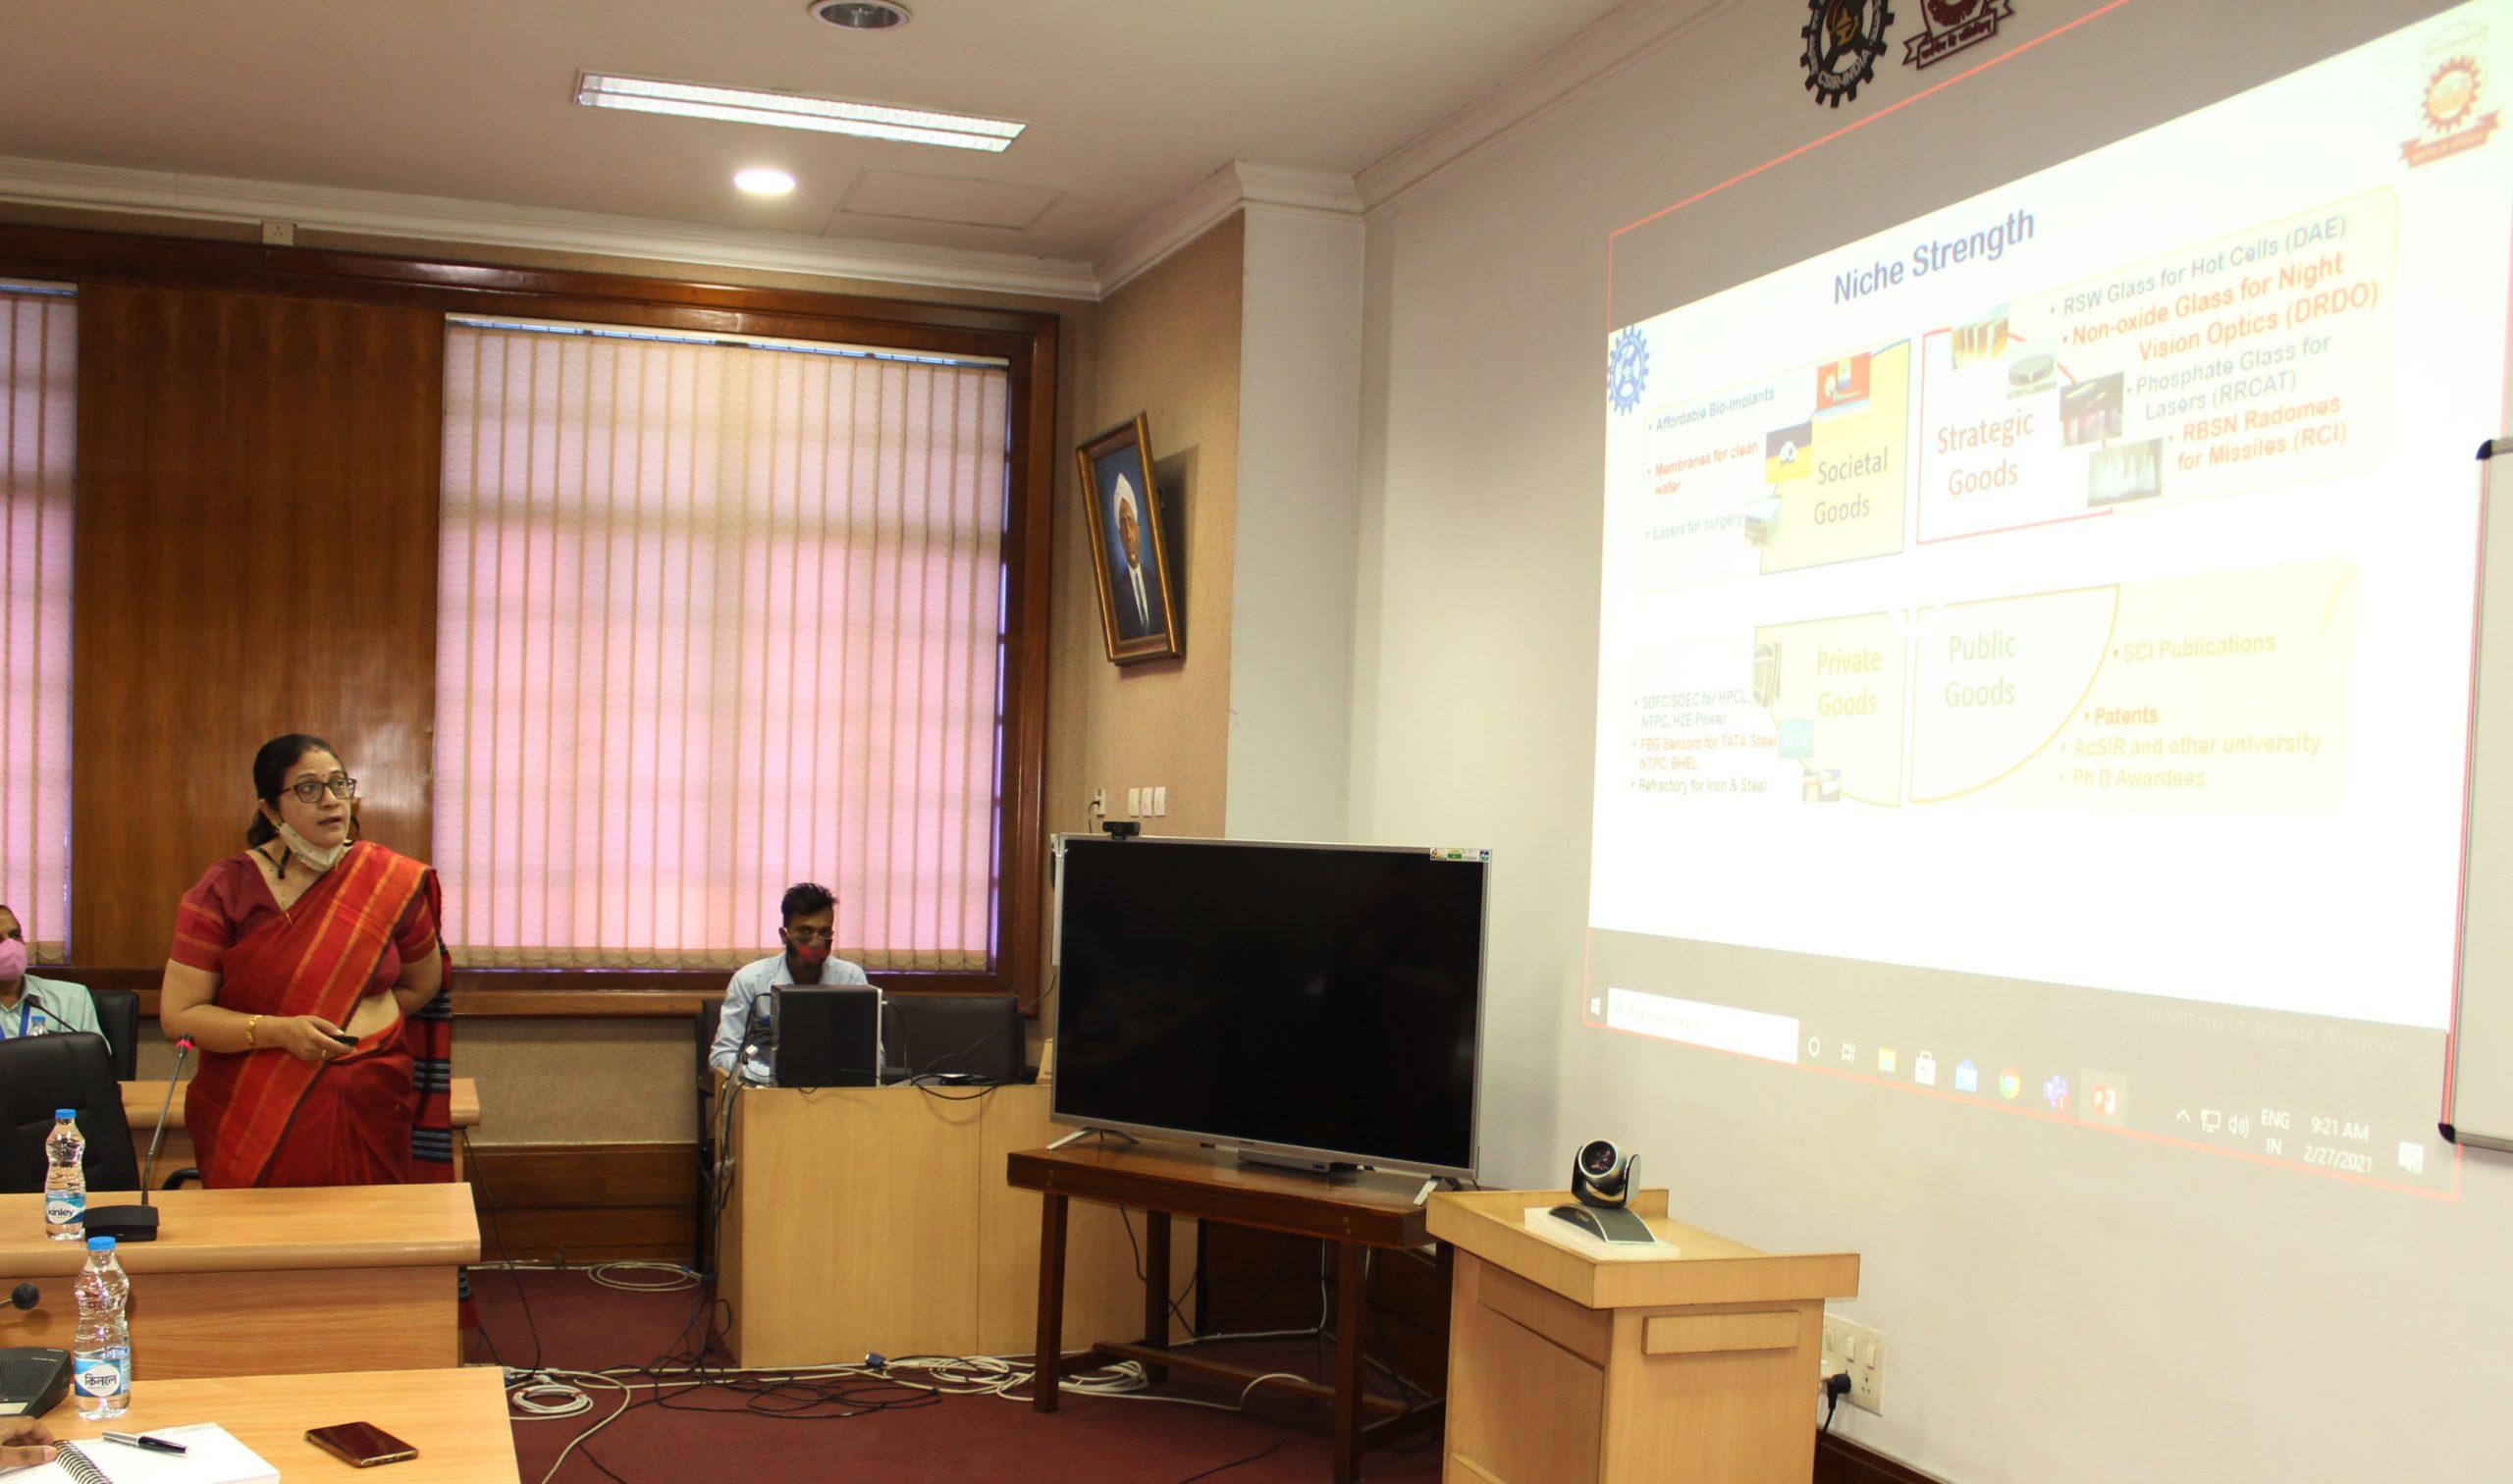 Director's presentation during DG CSIR's visit to CSIR-CGCRi, Kolkata